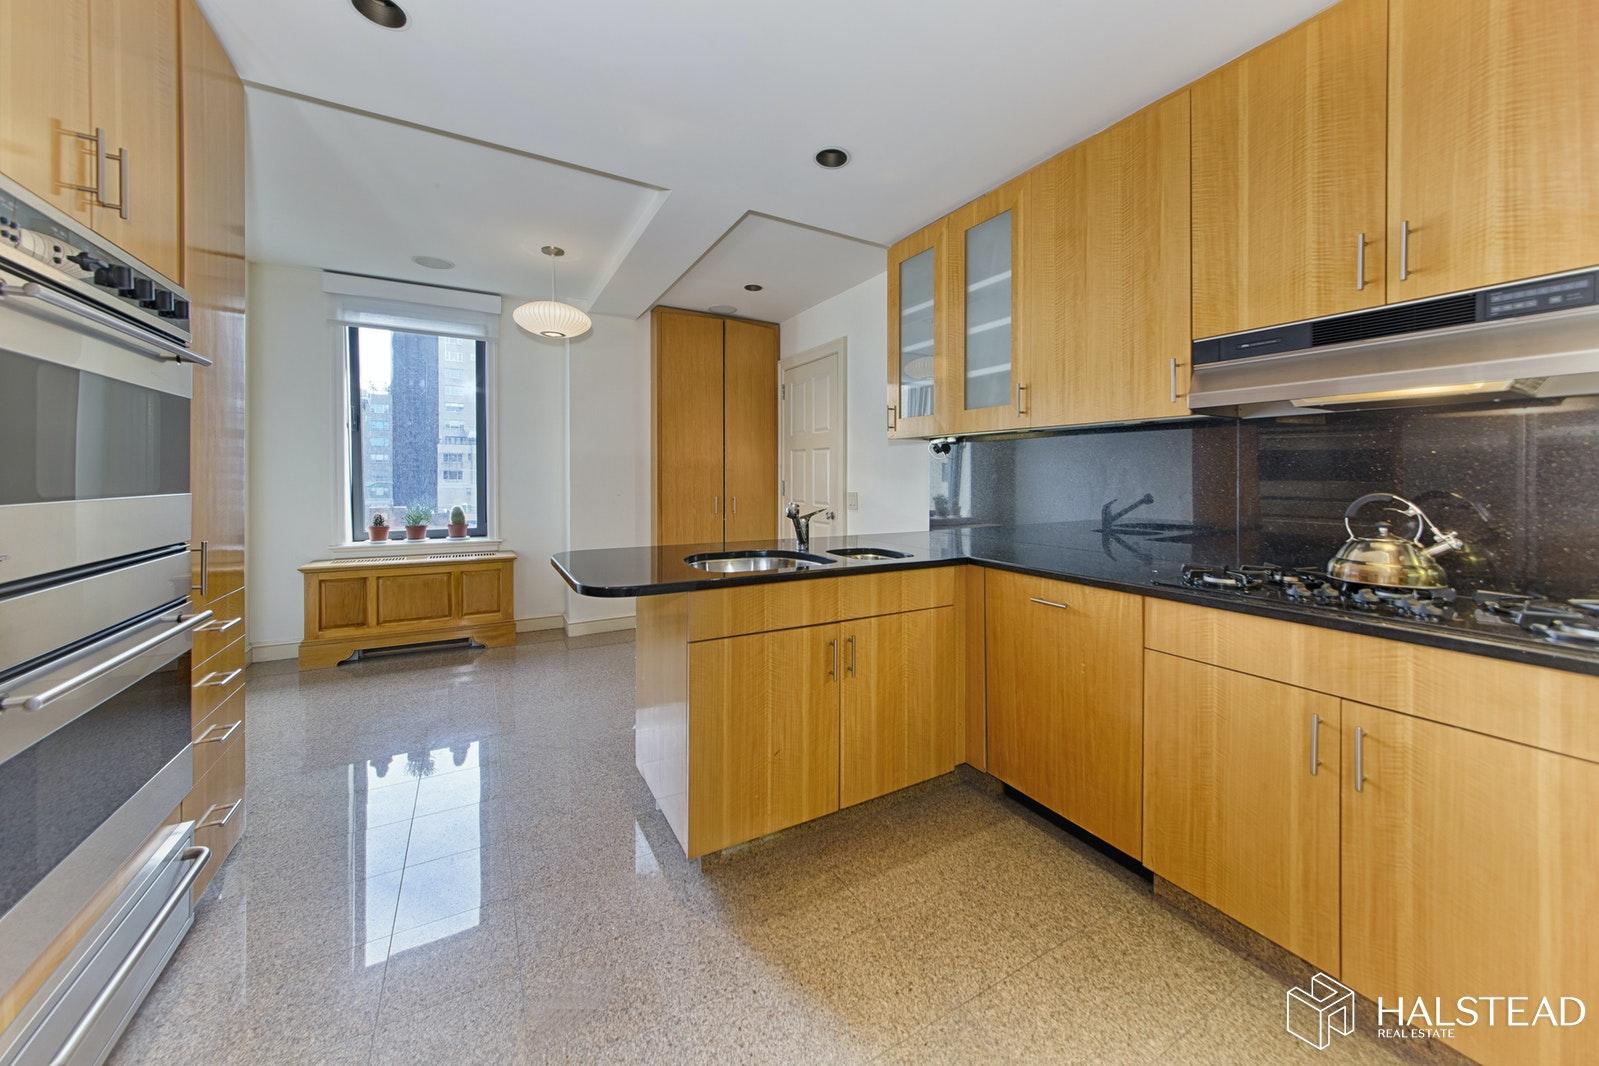 15 EAST 69TH STREET 11C, Upper East Side, $6,995,000, Web #: 20148116